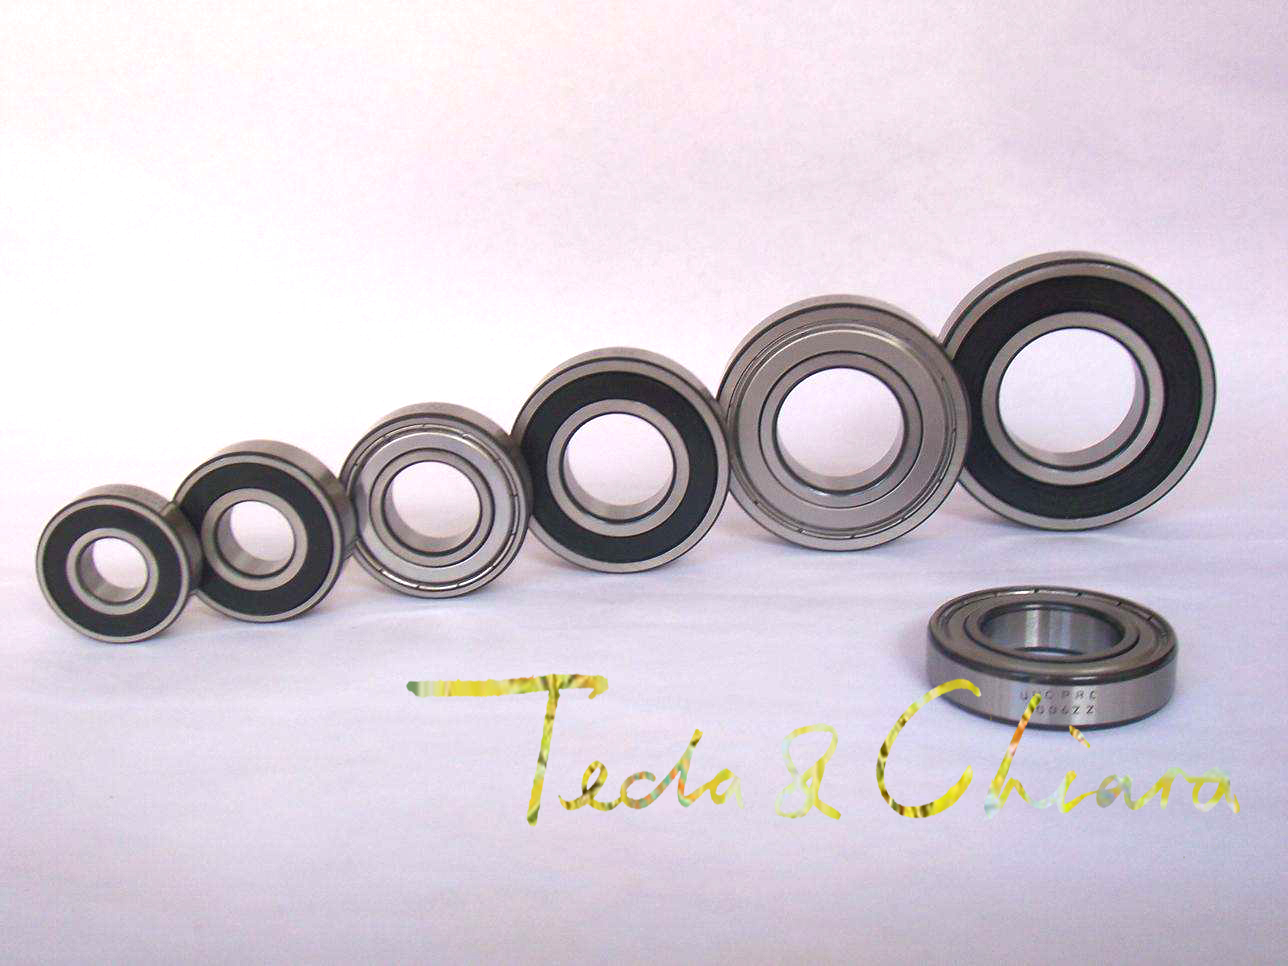 606 606ZZ 606RS 606-2Z 606Z 606-2RS ZZ RS RZ 2RZ Deep Groove Ball Bearings 6 x 17 x 6mm High Quality dial ydk 606